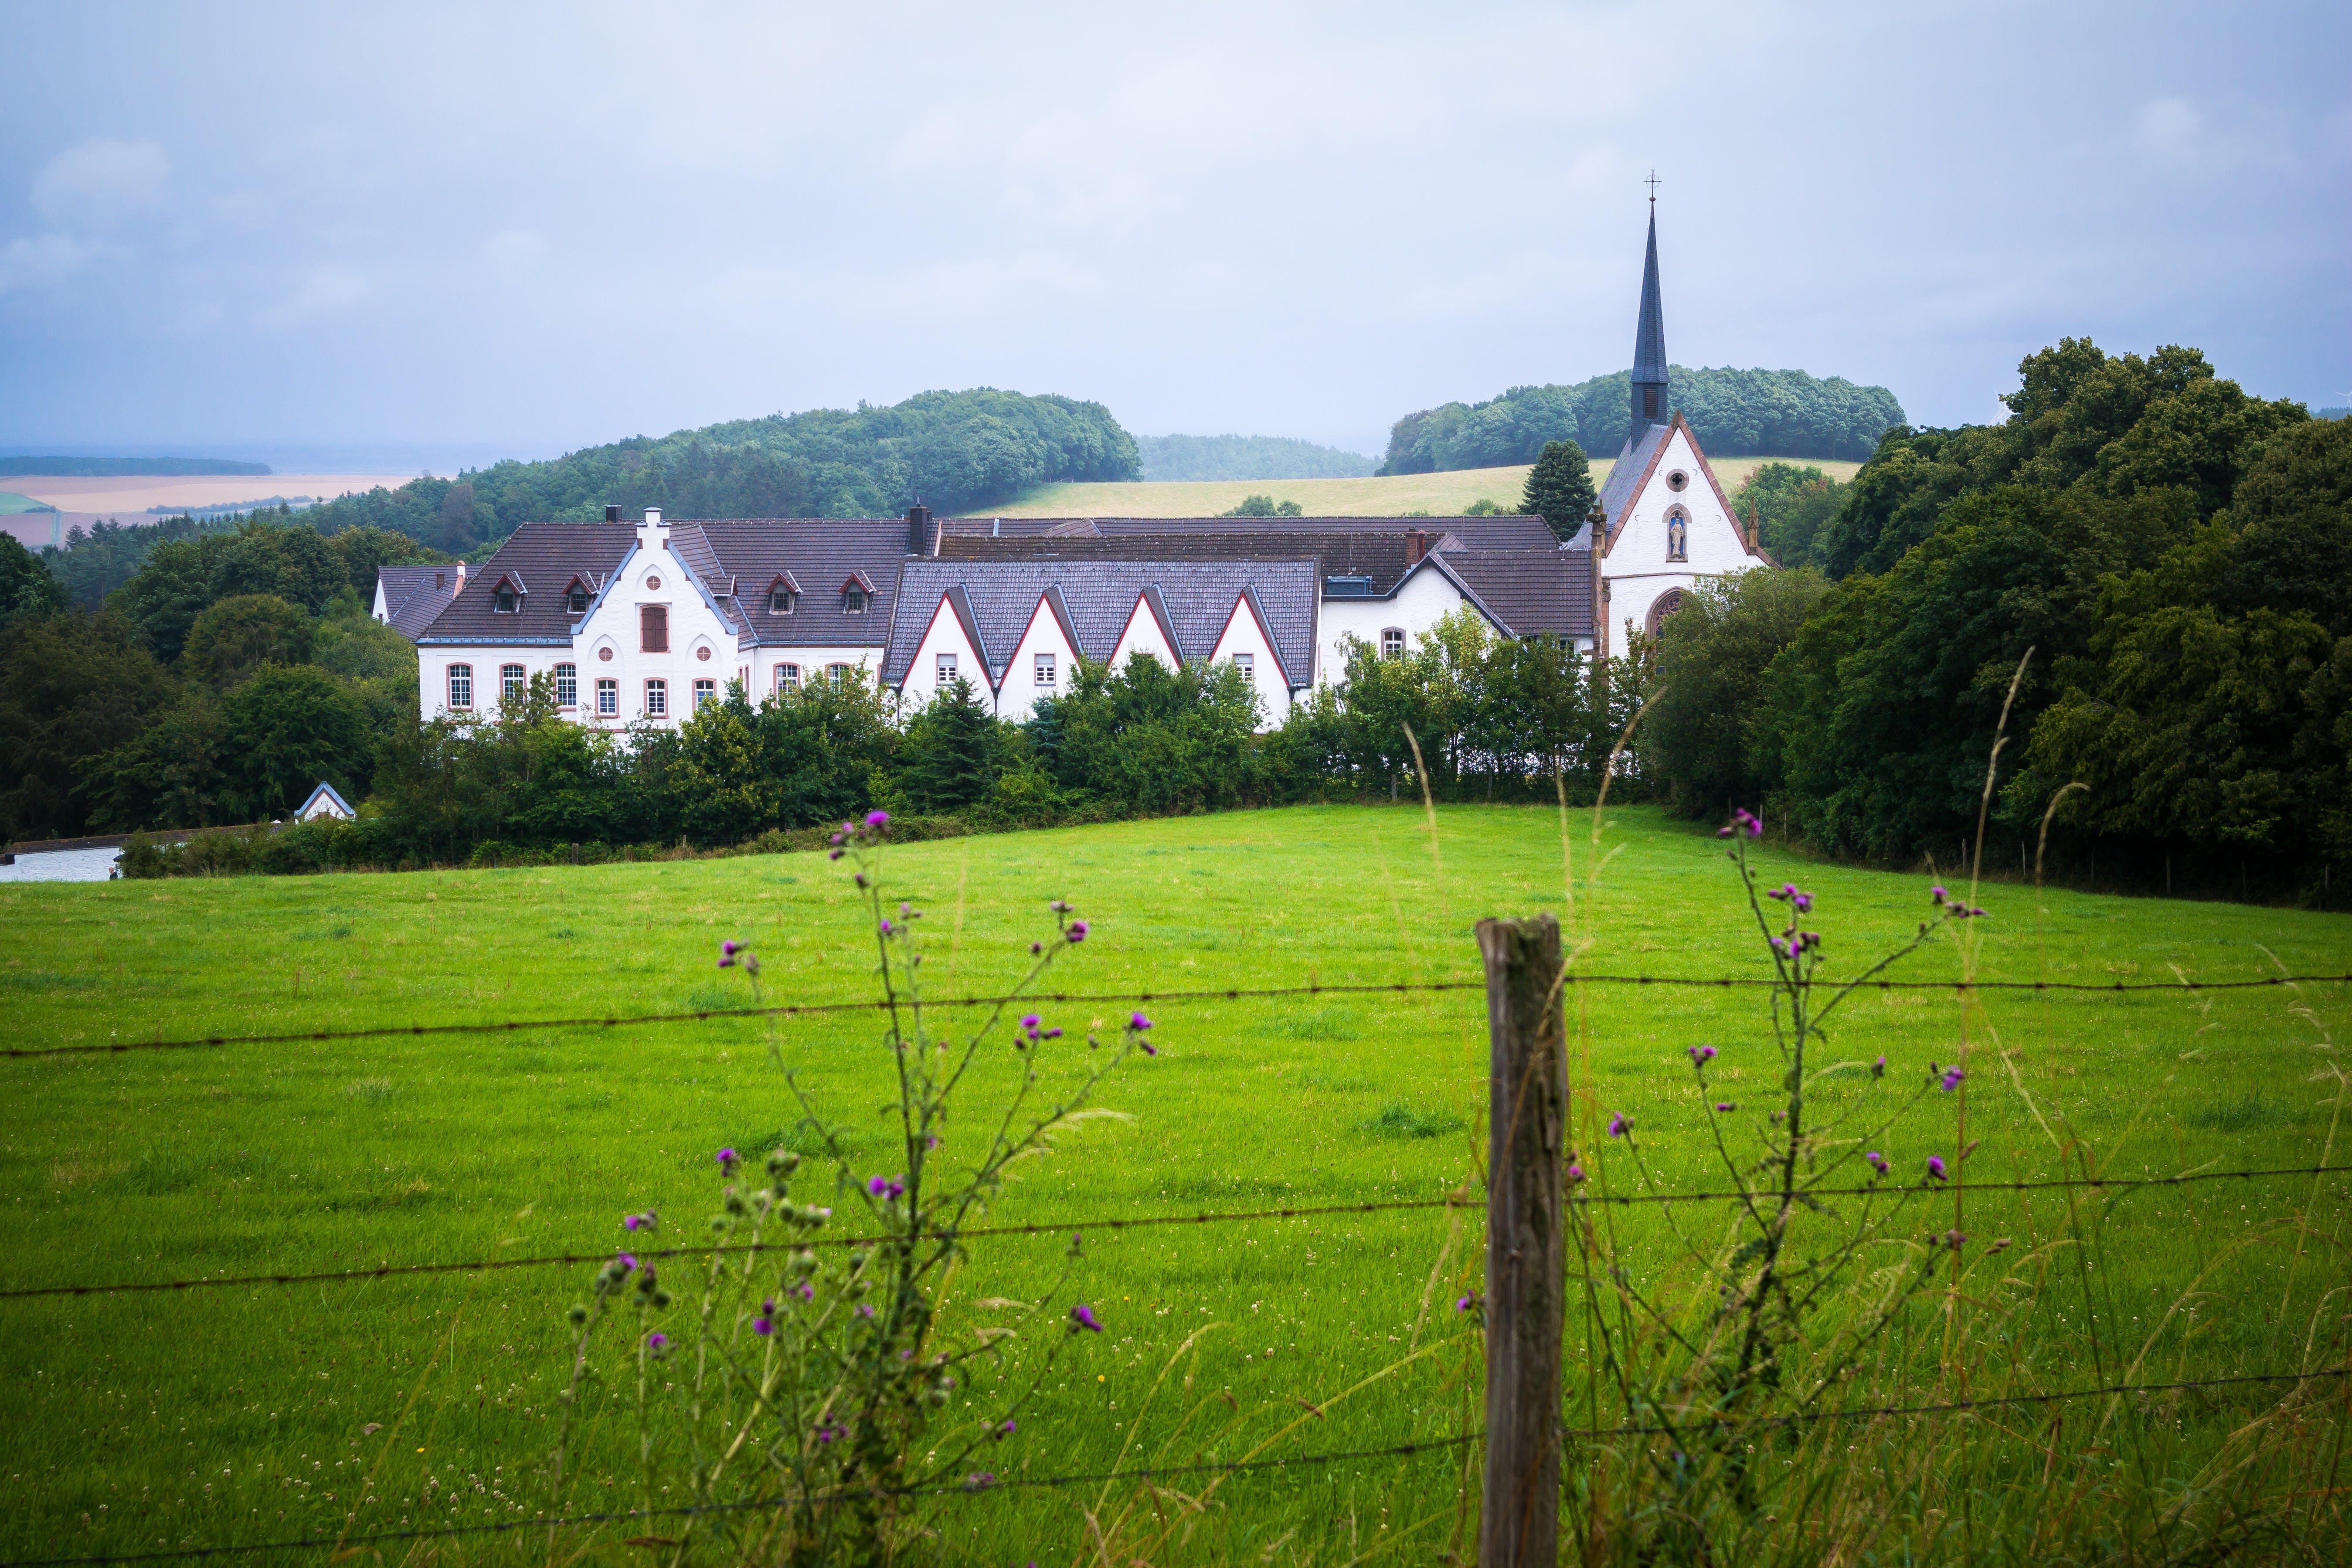 abbey, architecture, building